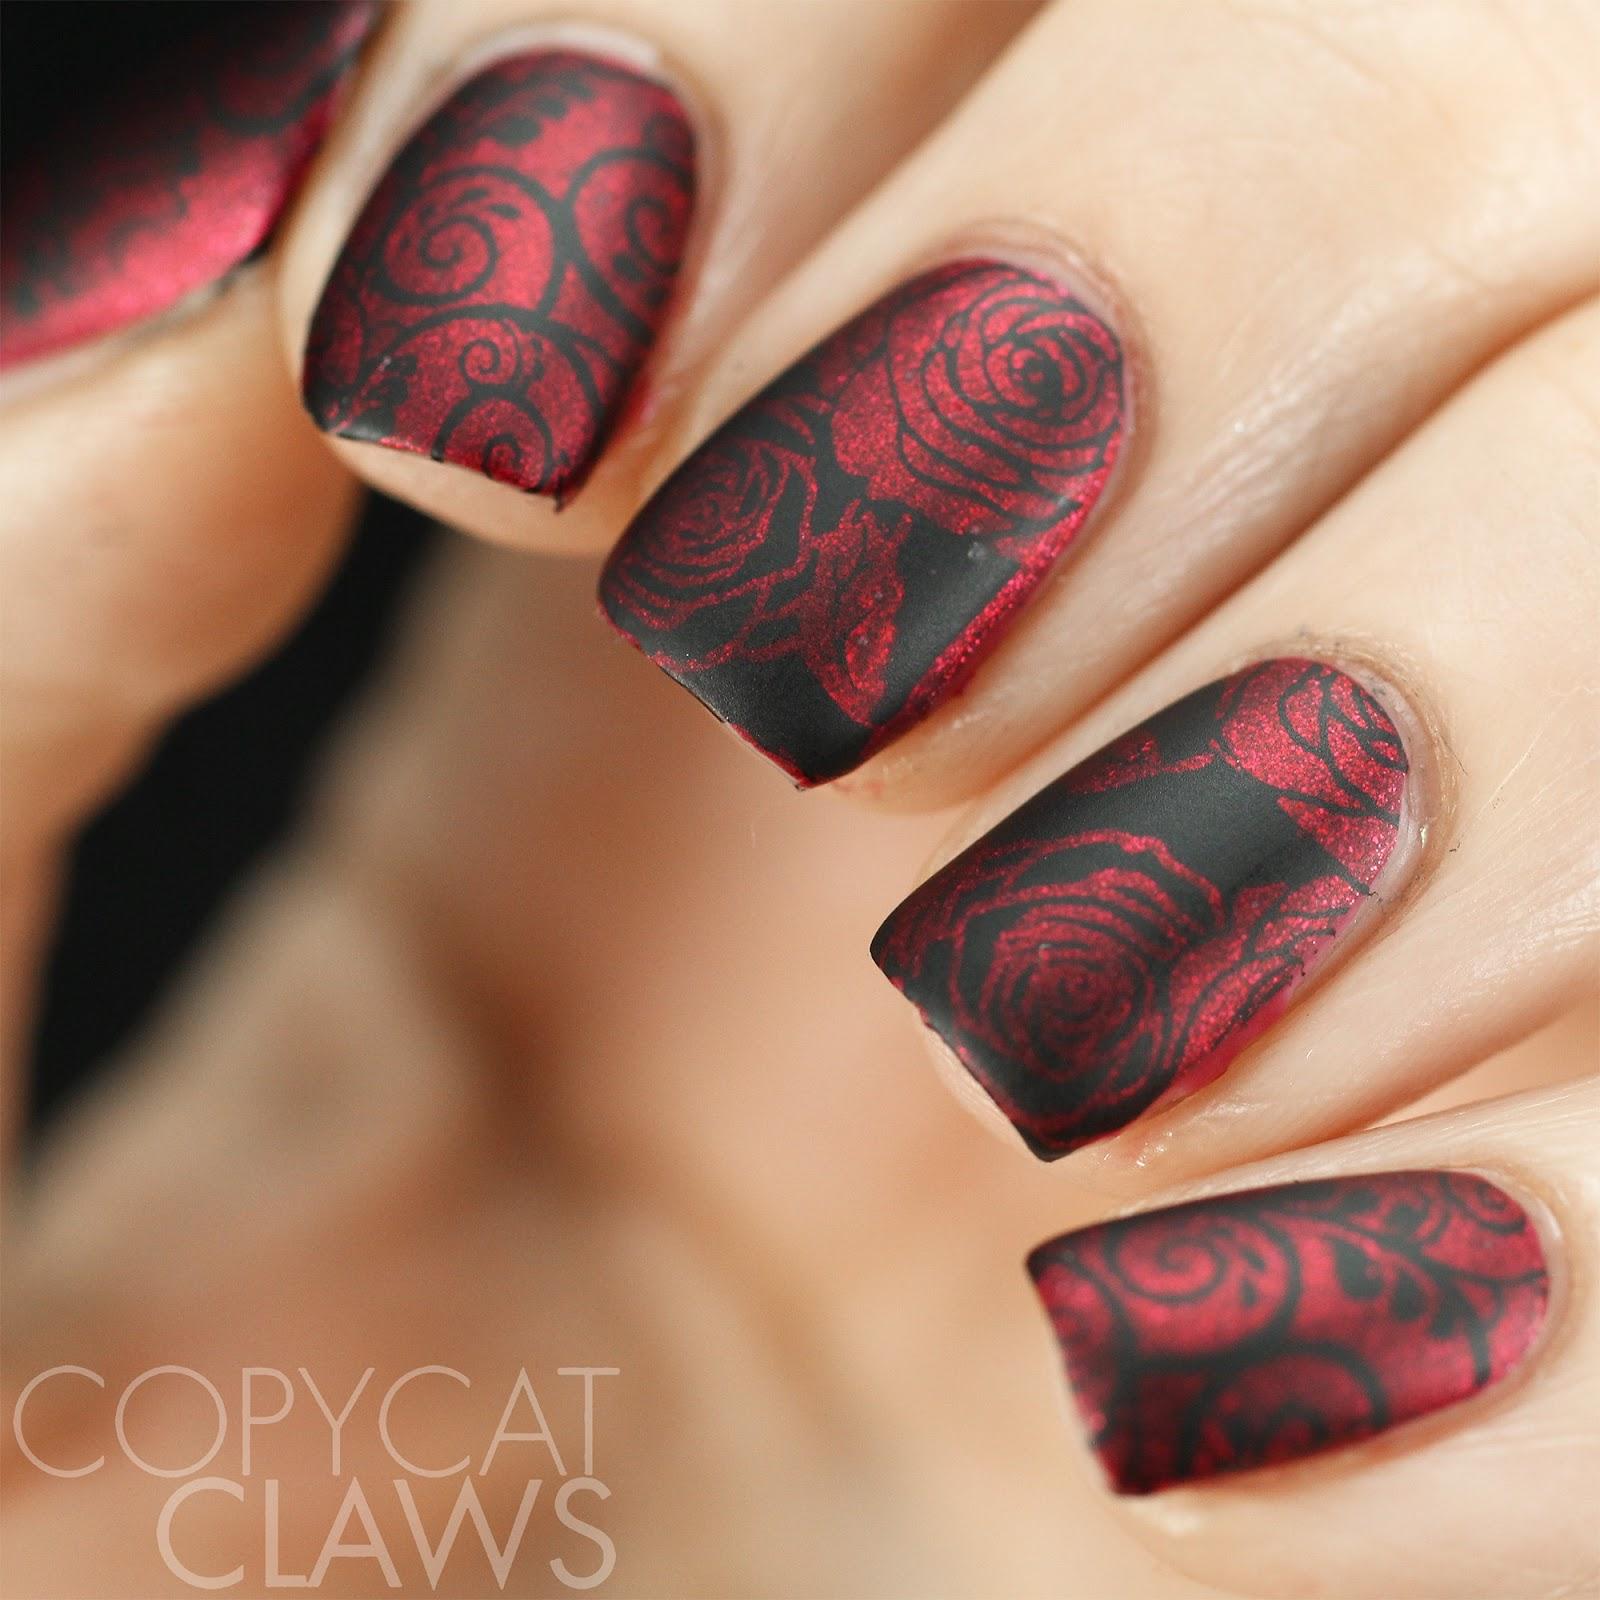 Copycat Claws: Nail Crazies Unite - Red & Black